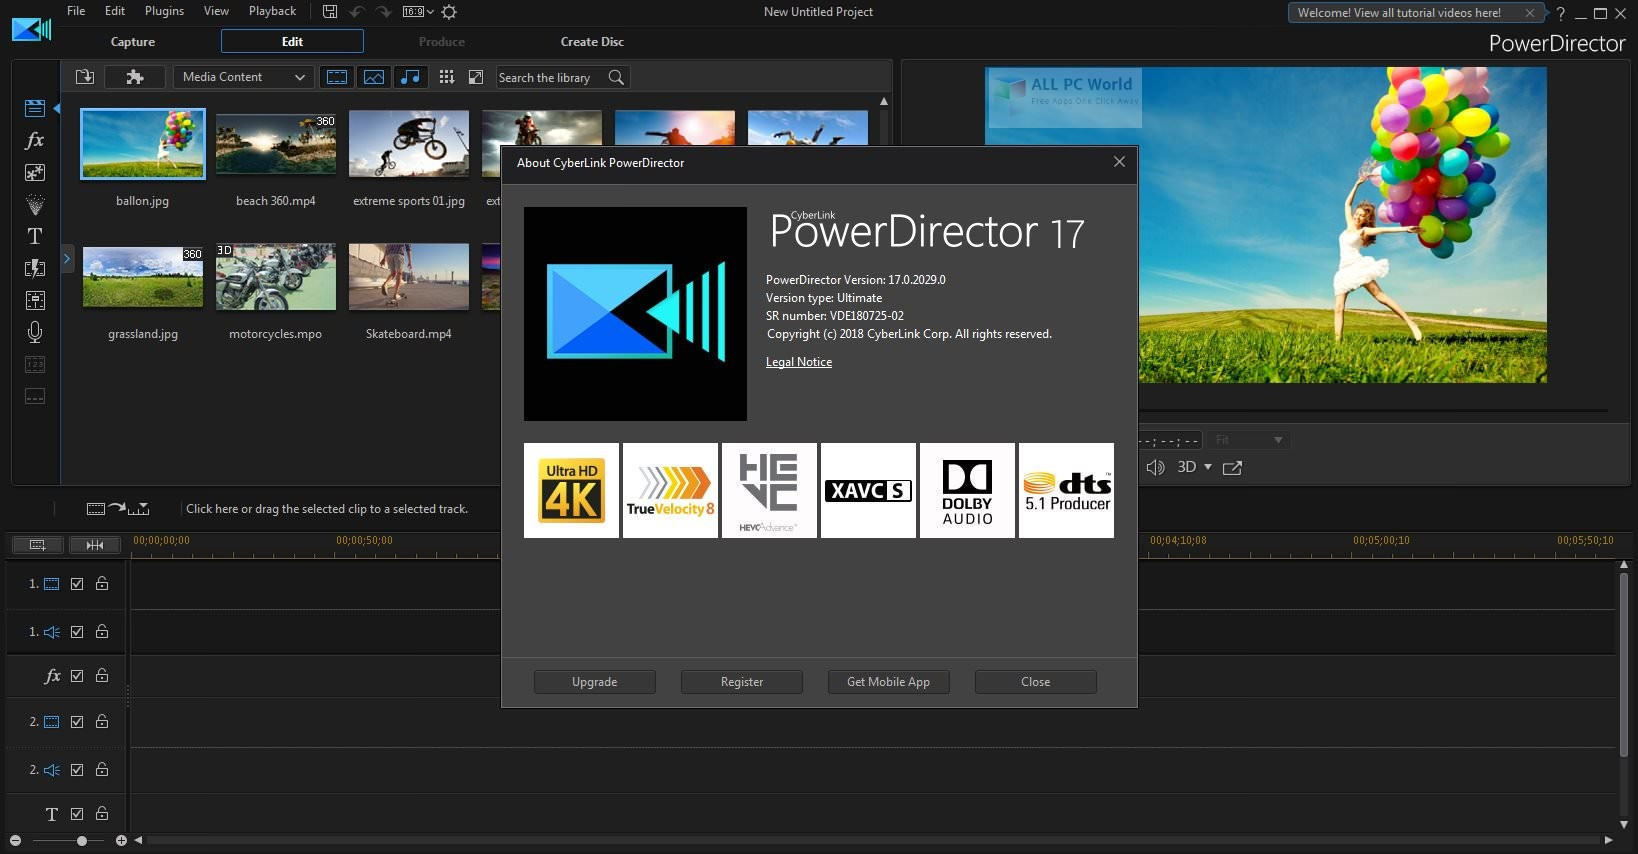 CyberLink PowerDirector Ultimate 17.0 Free Download